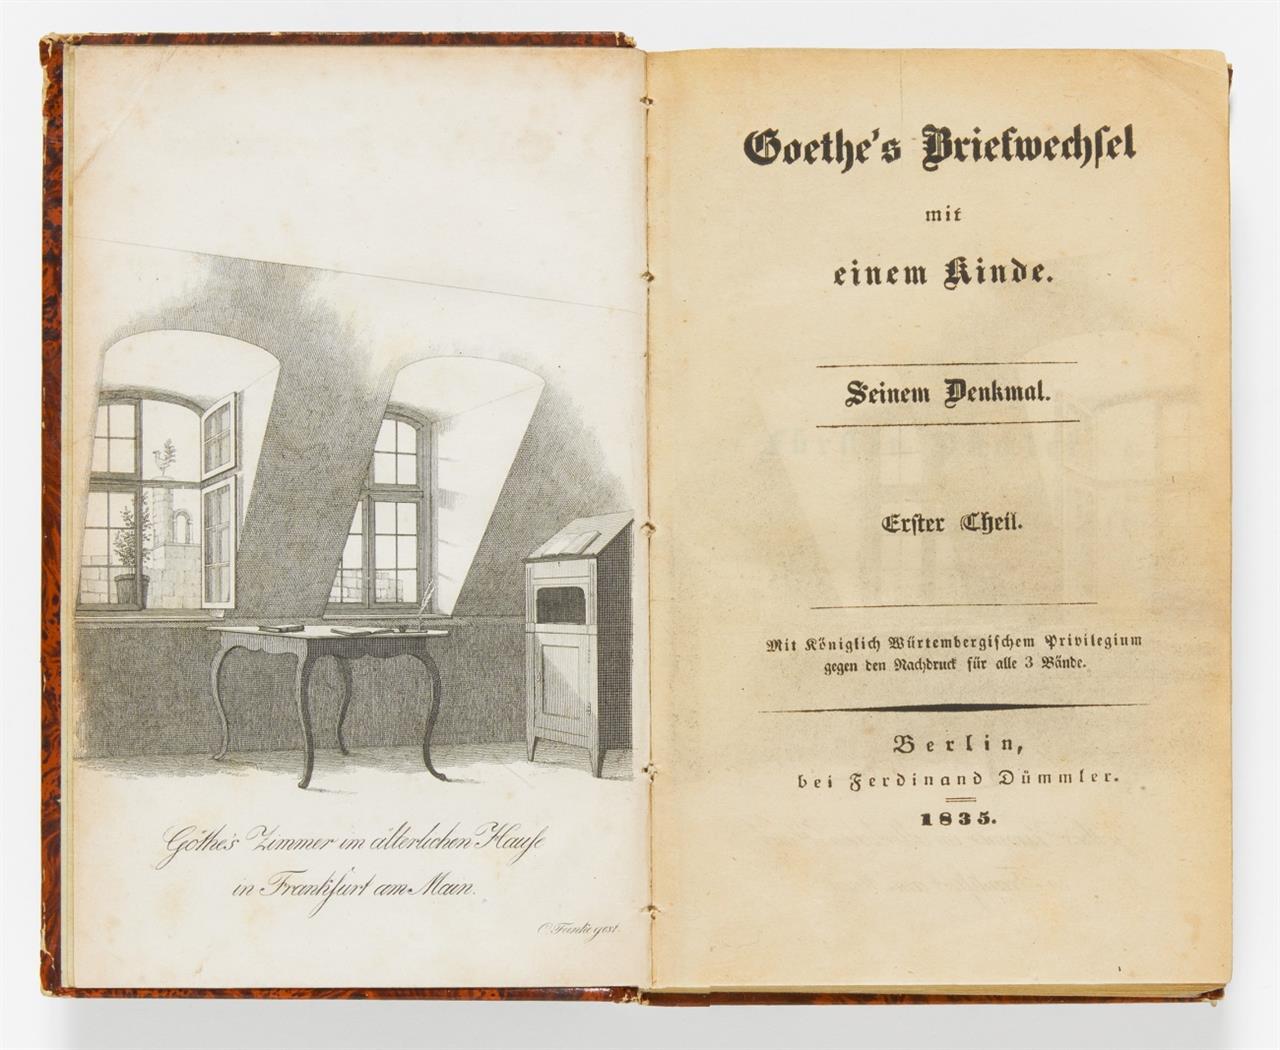 B. v. Arnim, Goethe's Briefwechsel mit einem Kinde. 3 Bde. Berlin 1835.